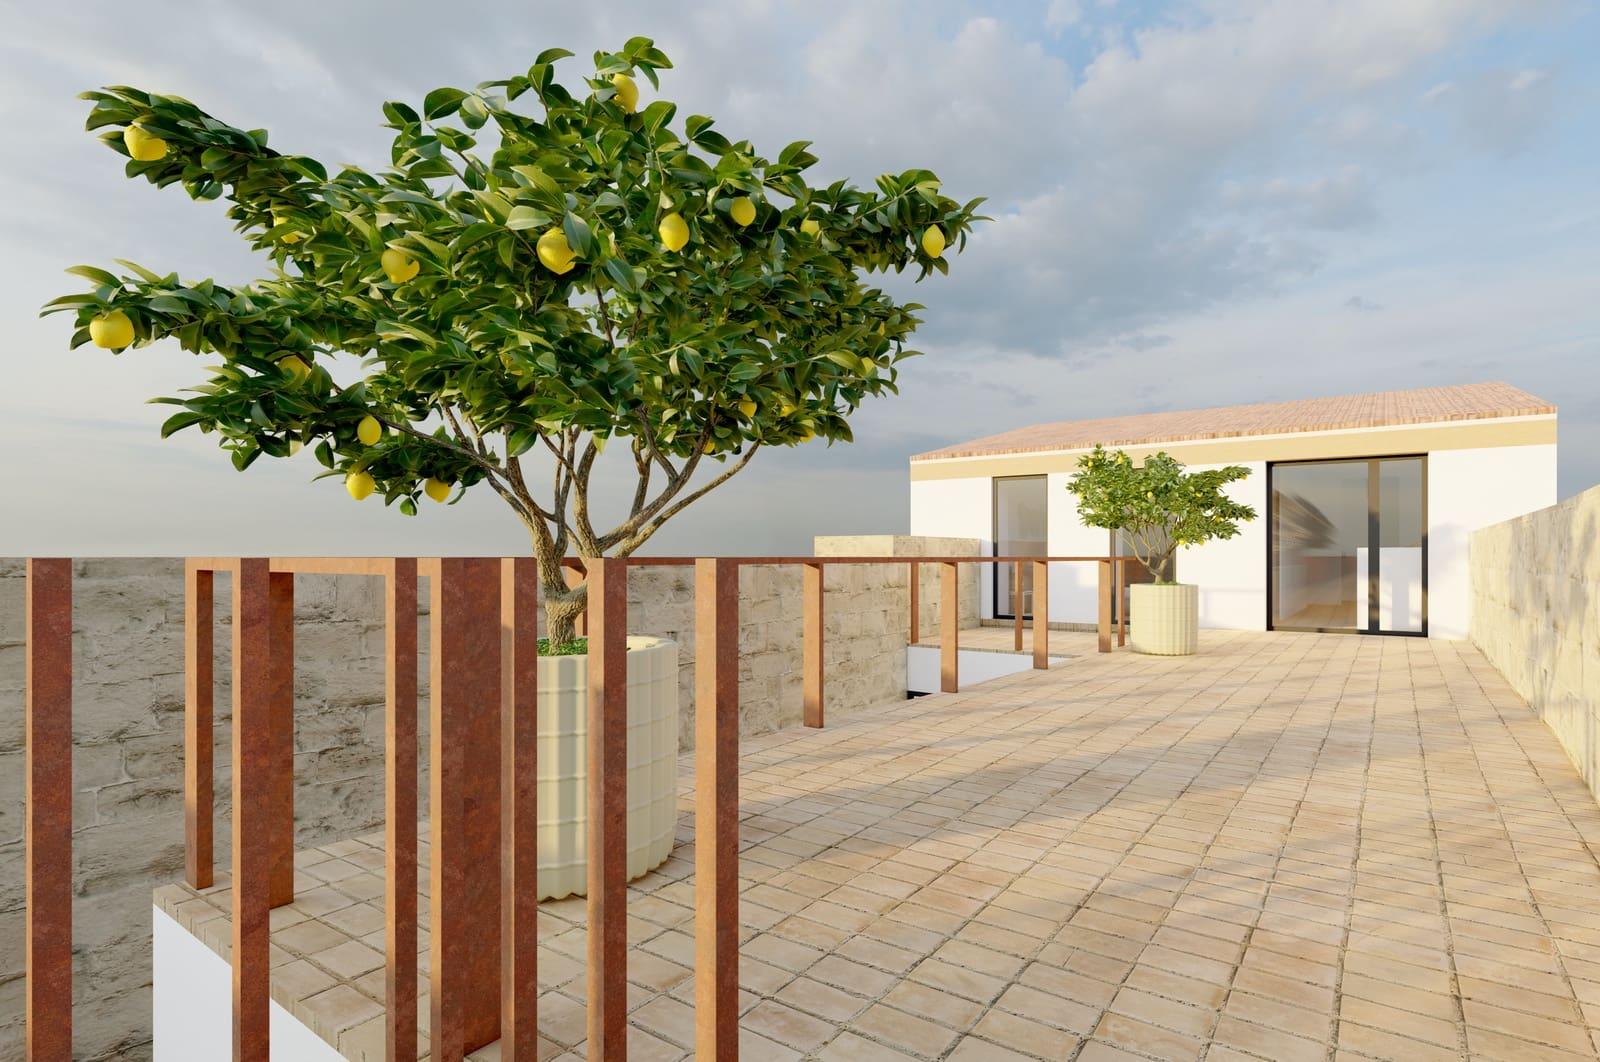 4 bedroom Townhouse for sale in Teulada - € 325,000 (Ref: 6000339)